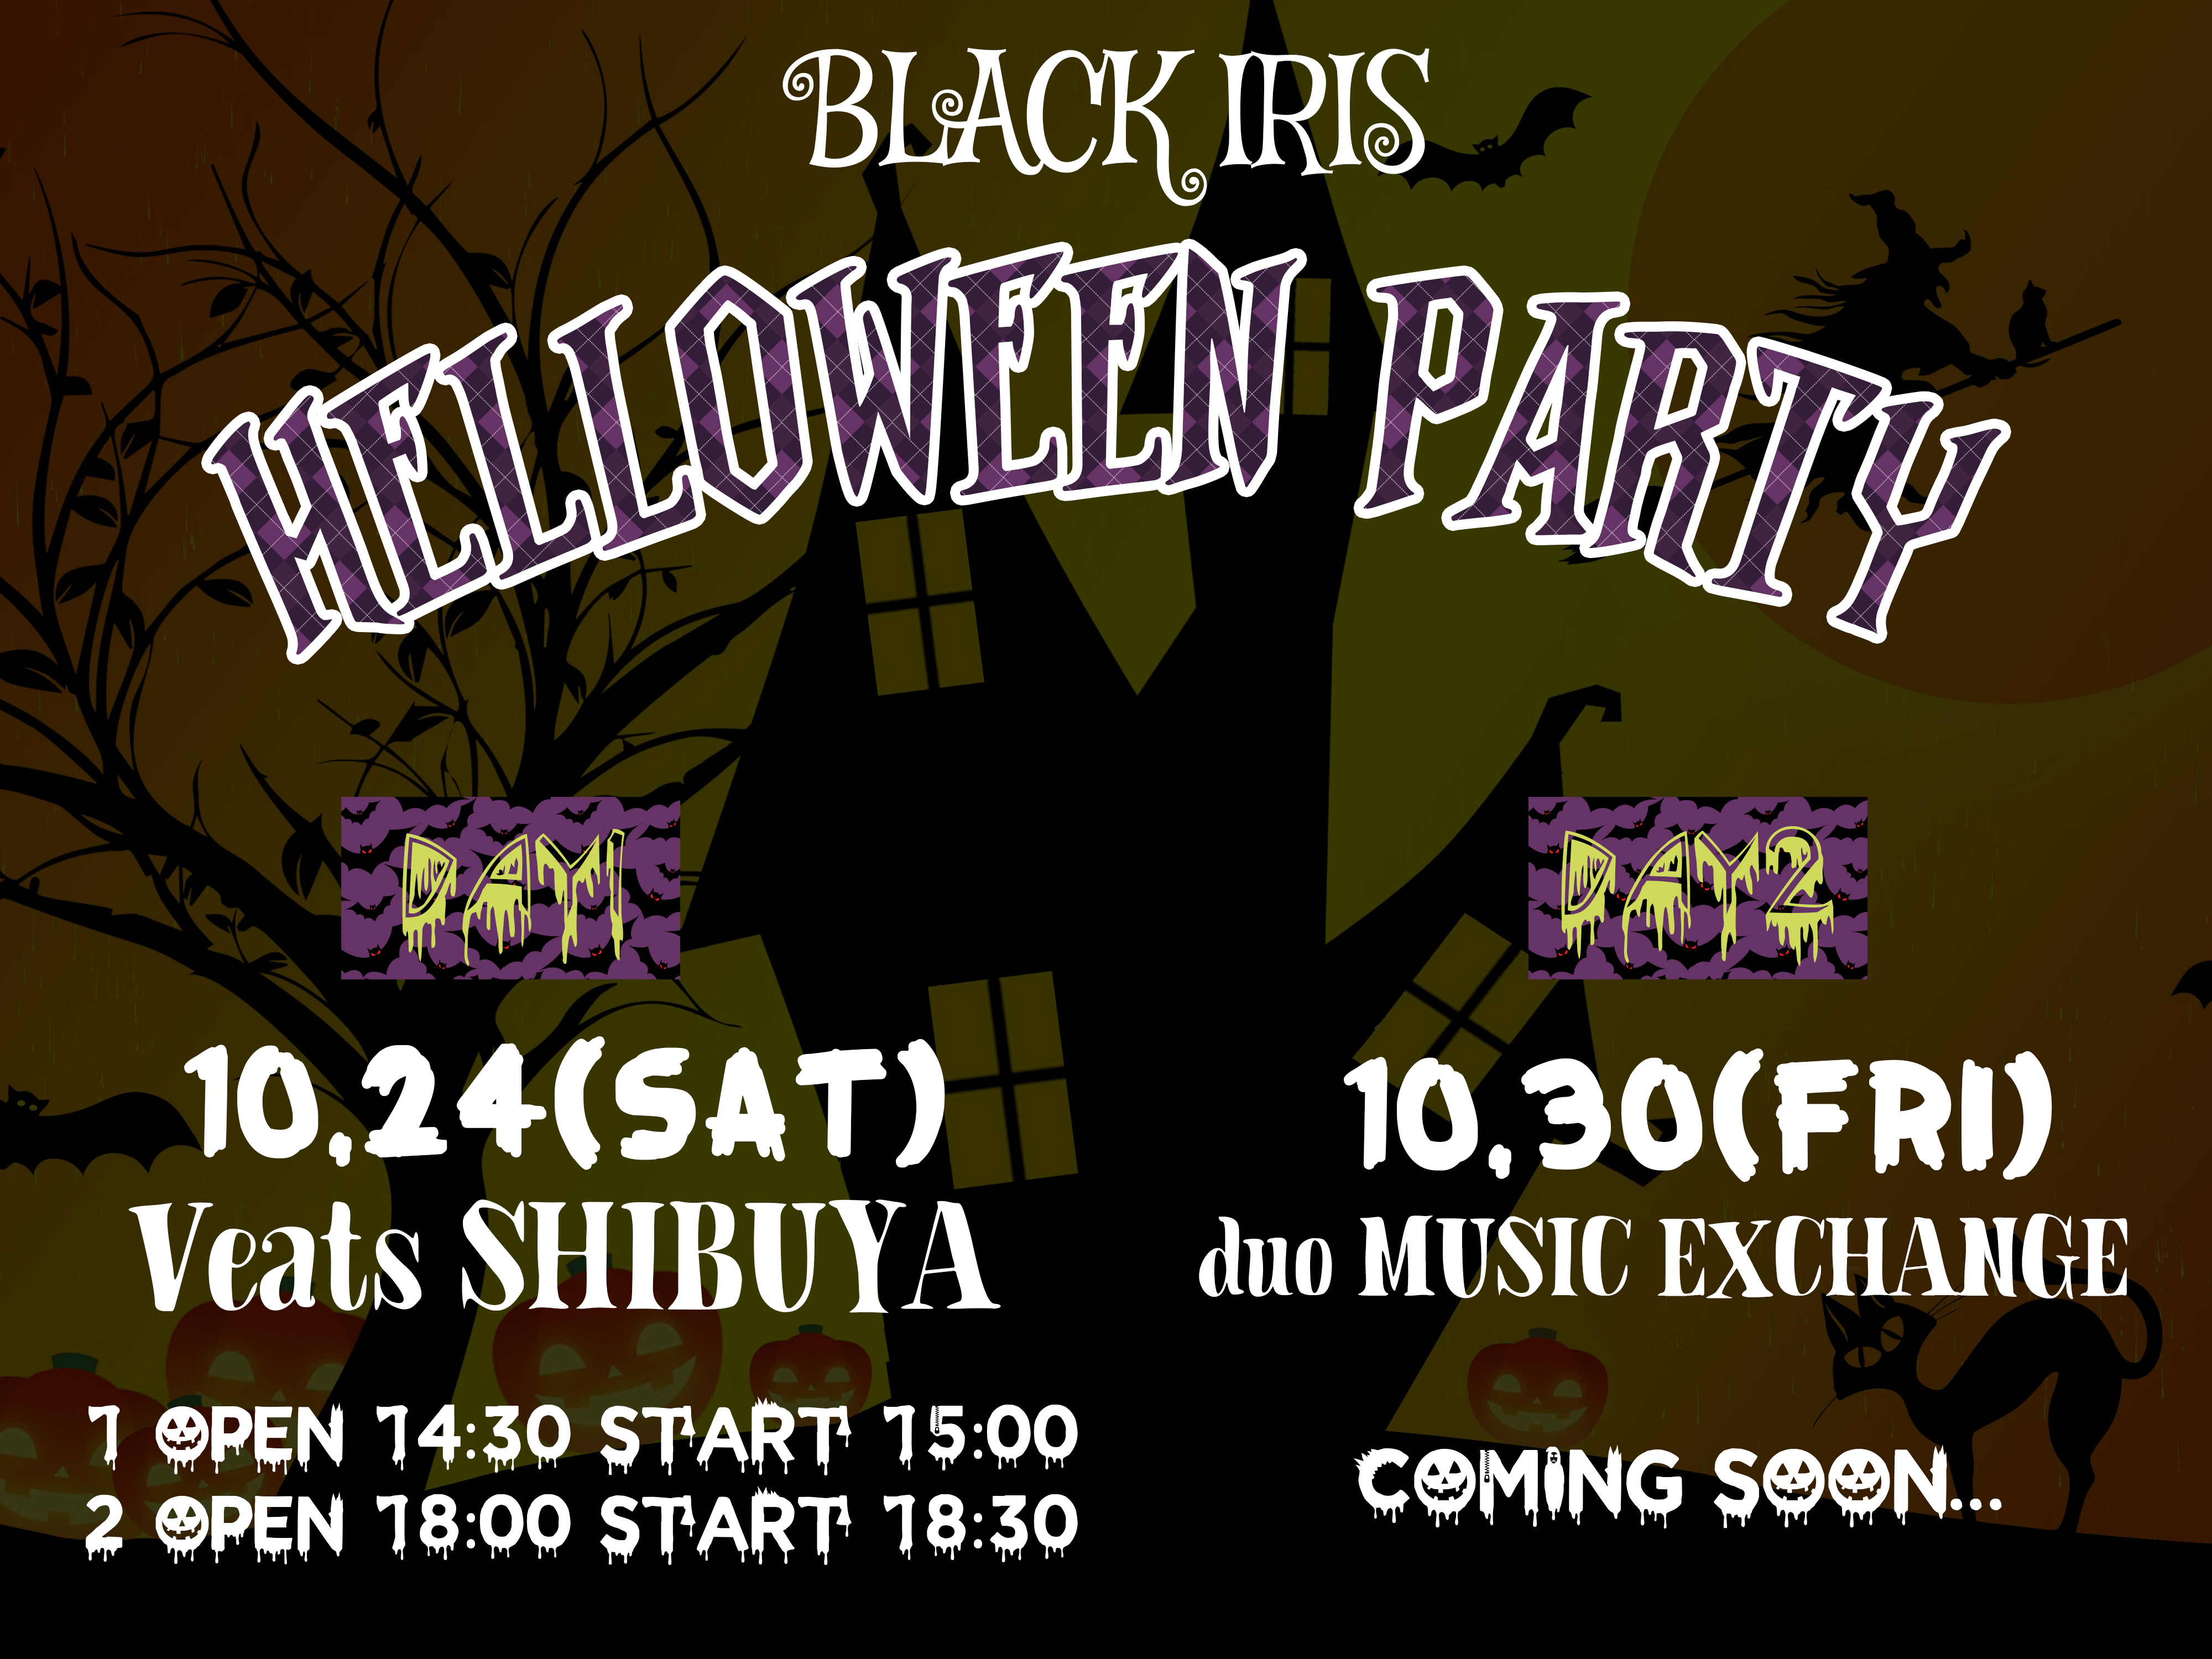 BLACK IRIS HELLOWEEN PARTY day1